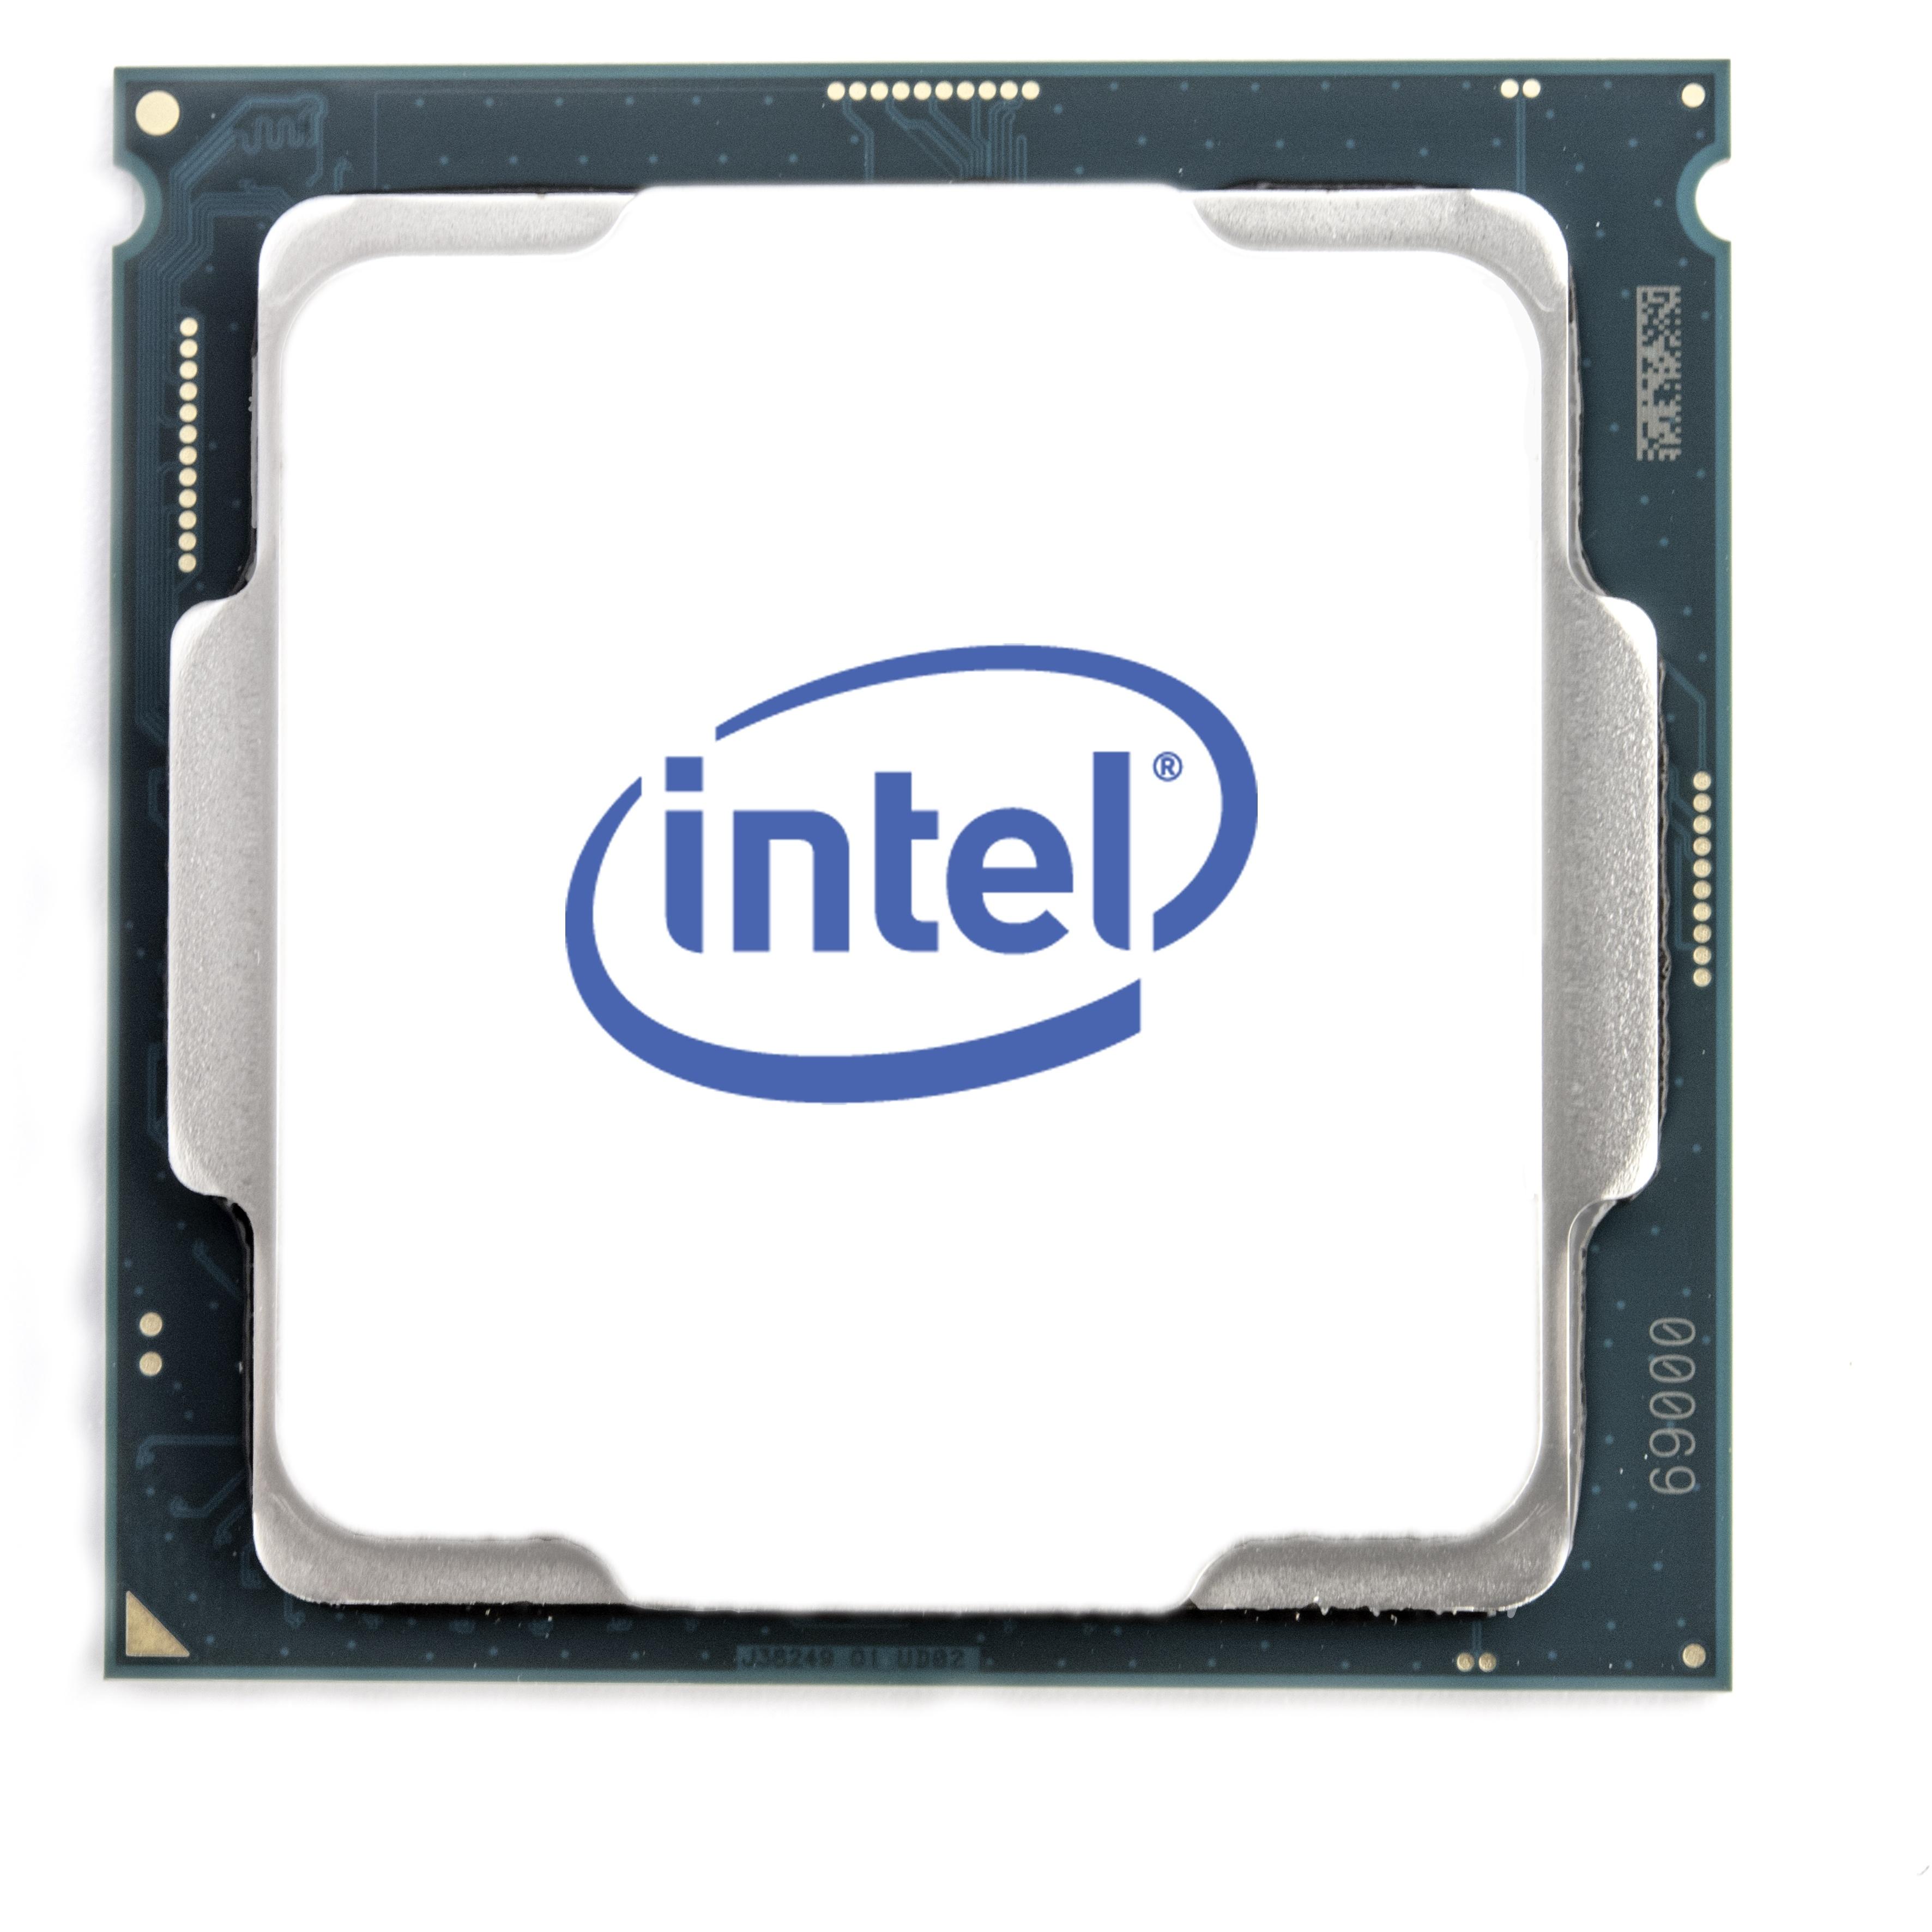 Processore cpu intel desktop core i7 10700kf 3.80ghz 16mb s1200 box